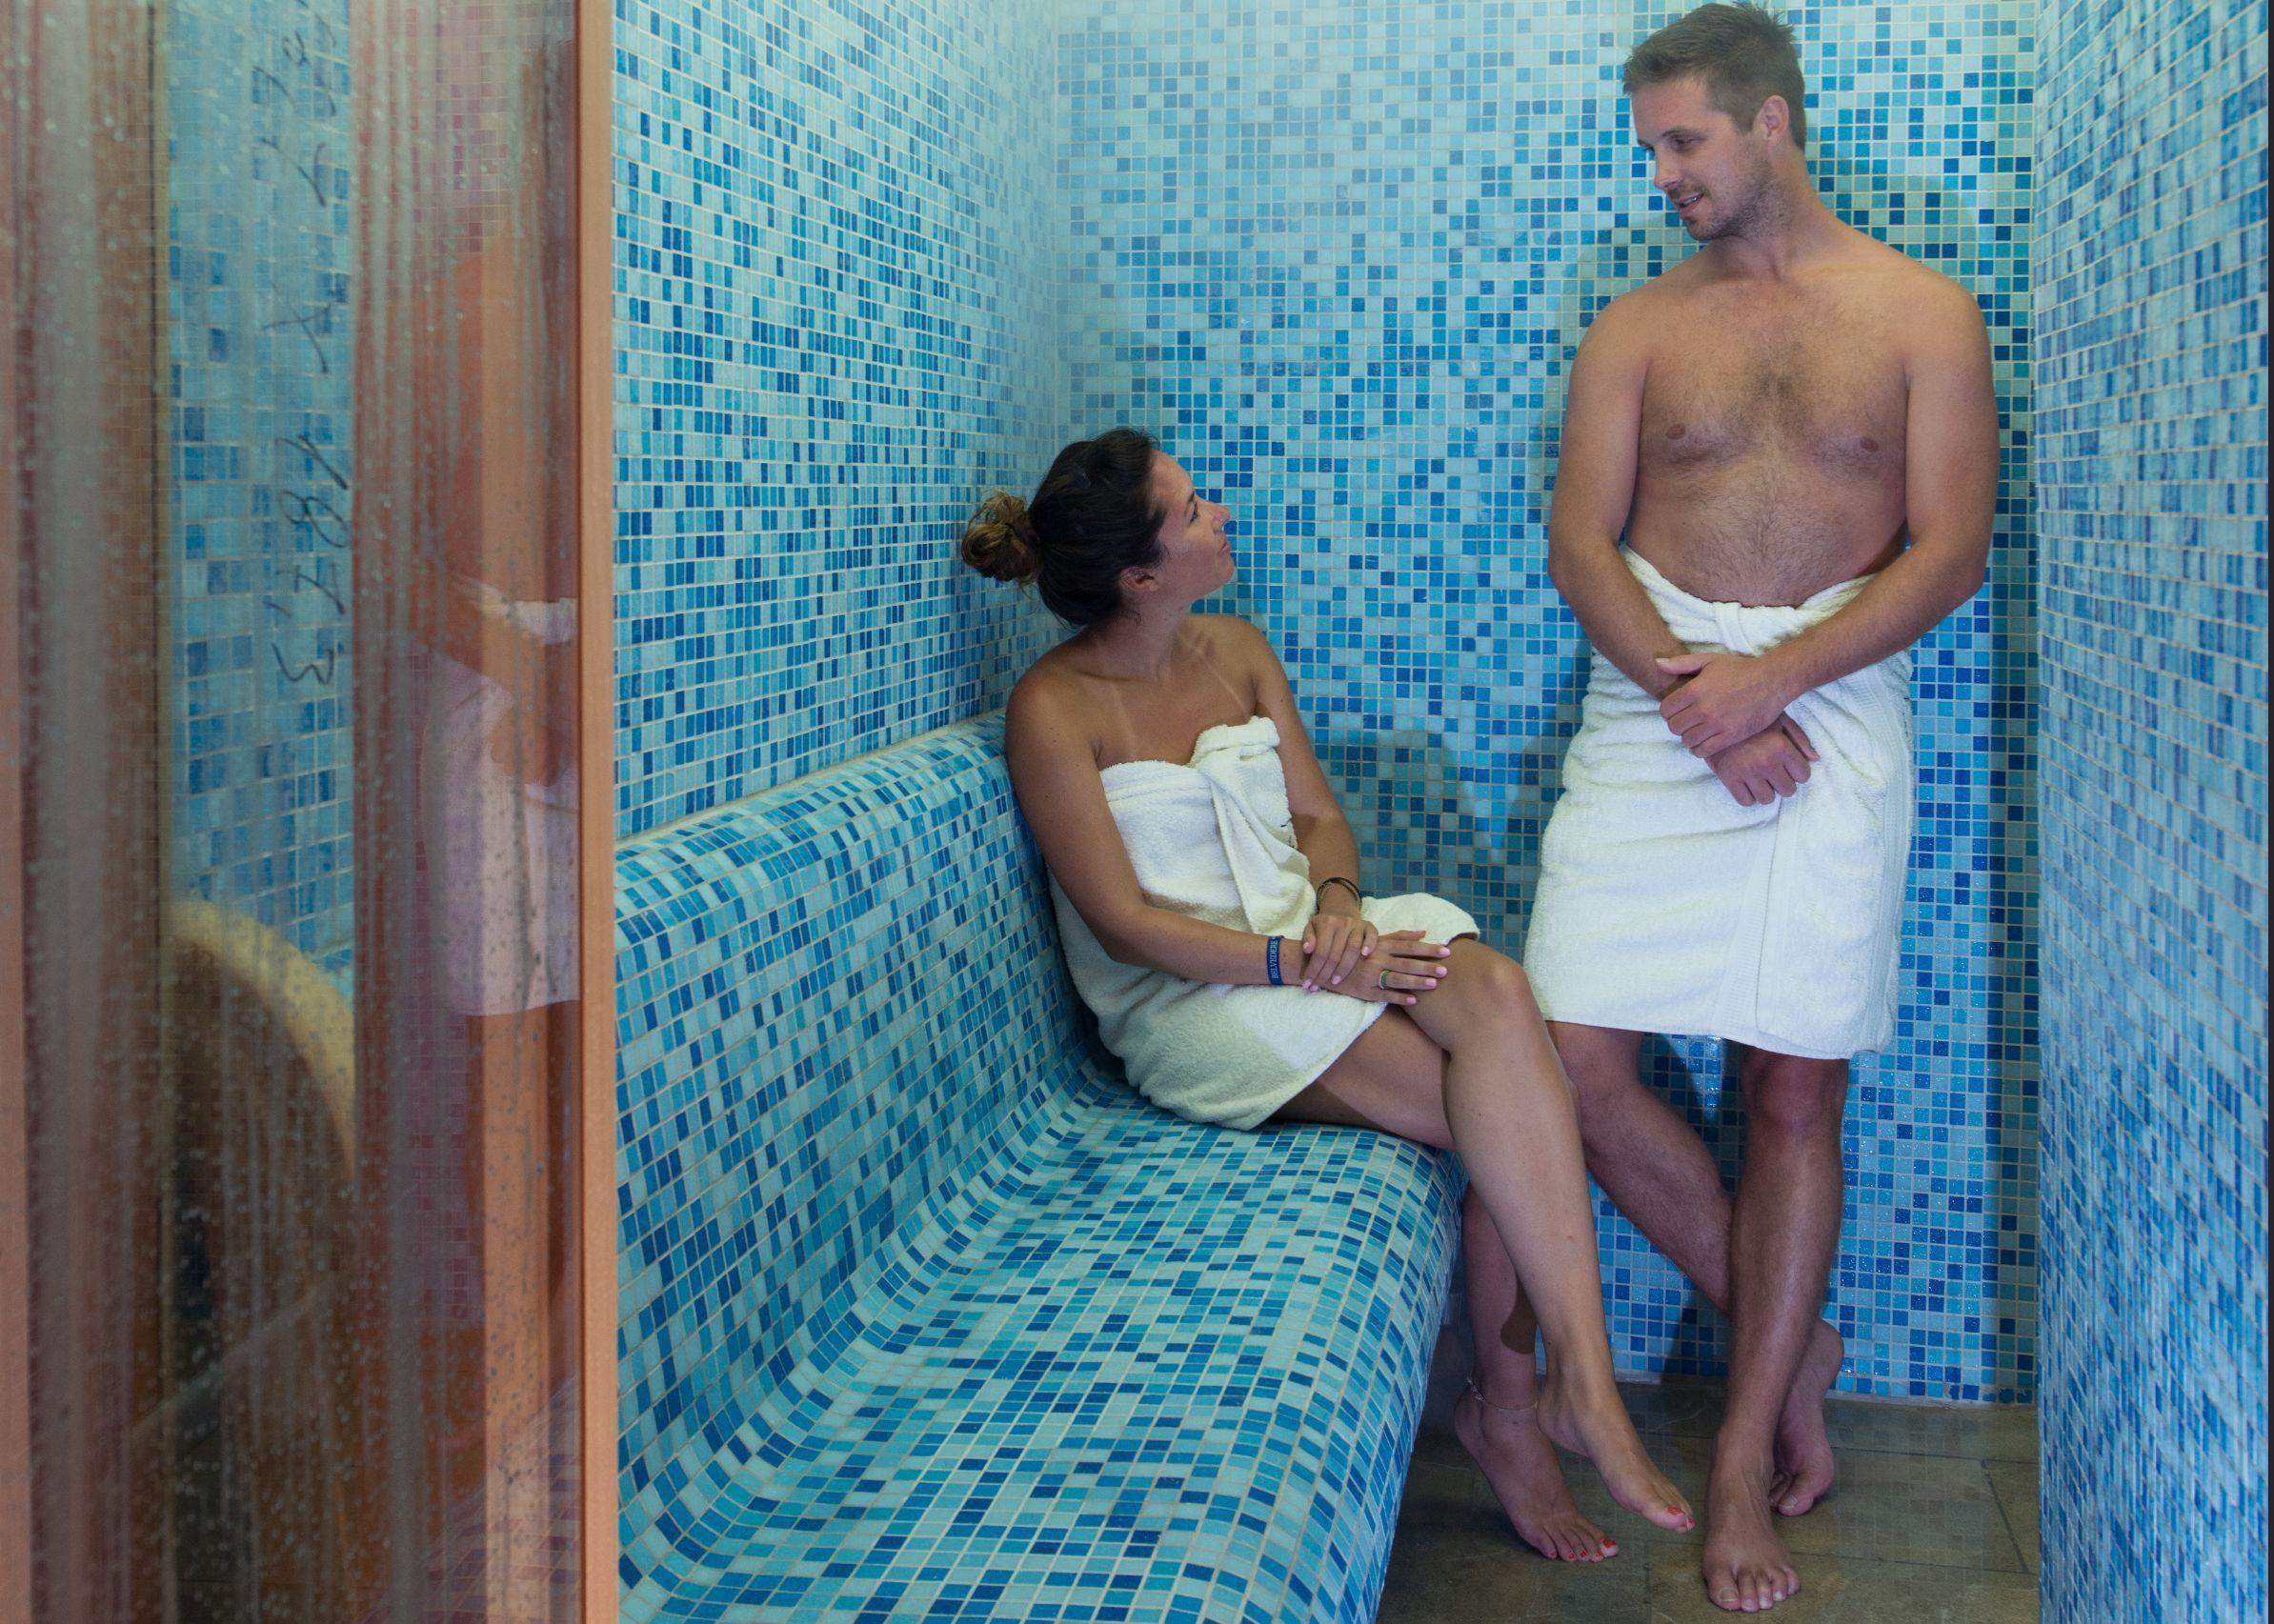 http://www.orextravel.sk/OREX/hotelphotos/royal-belvedere-general-0051.jpg